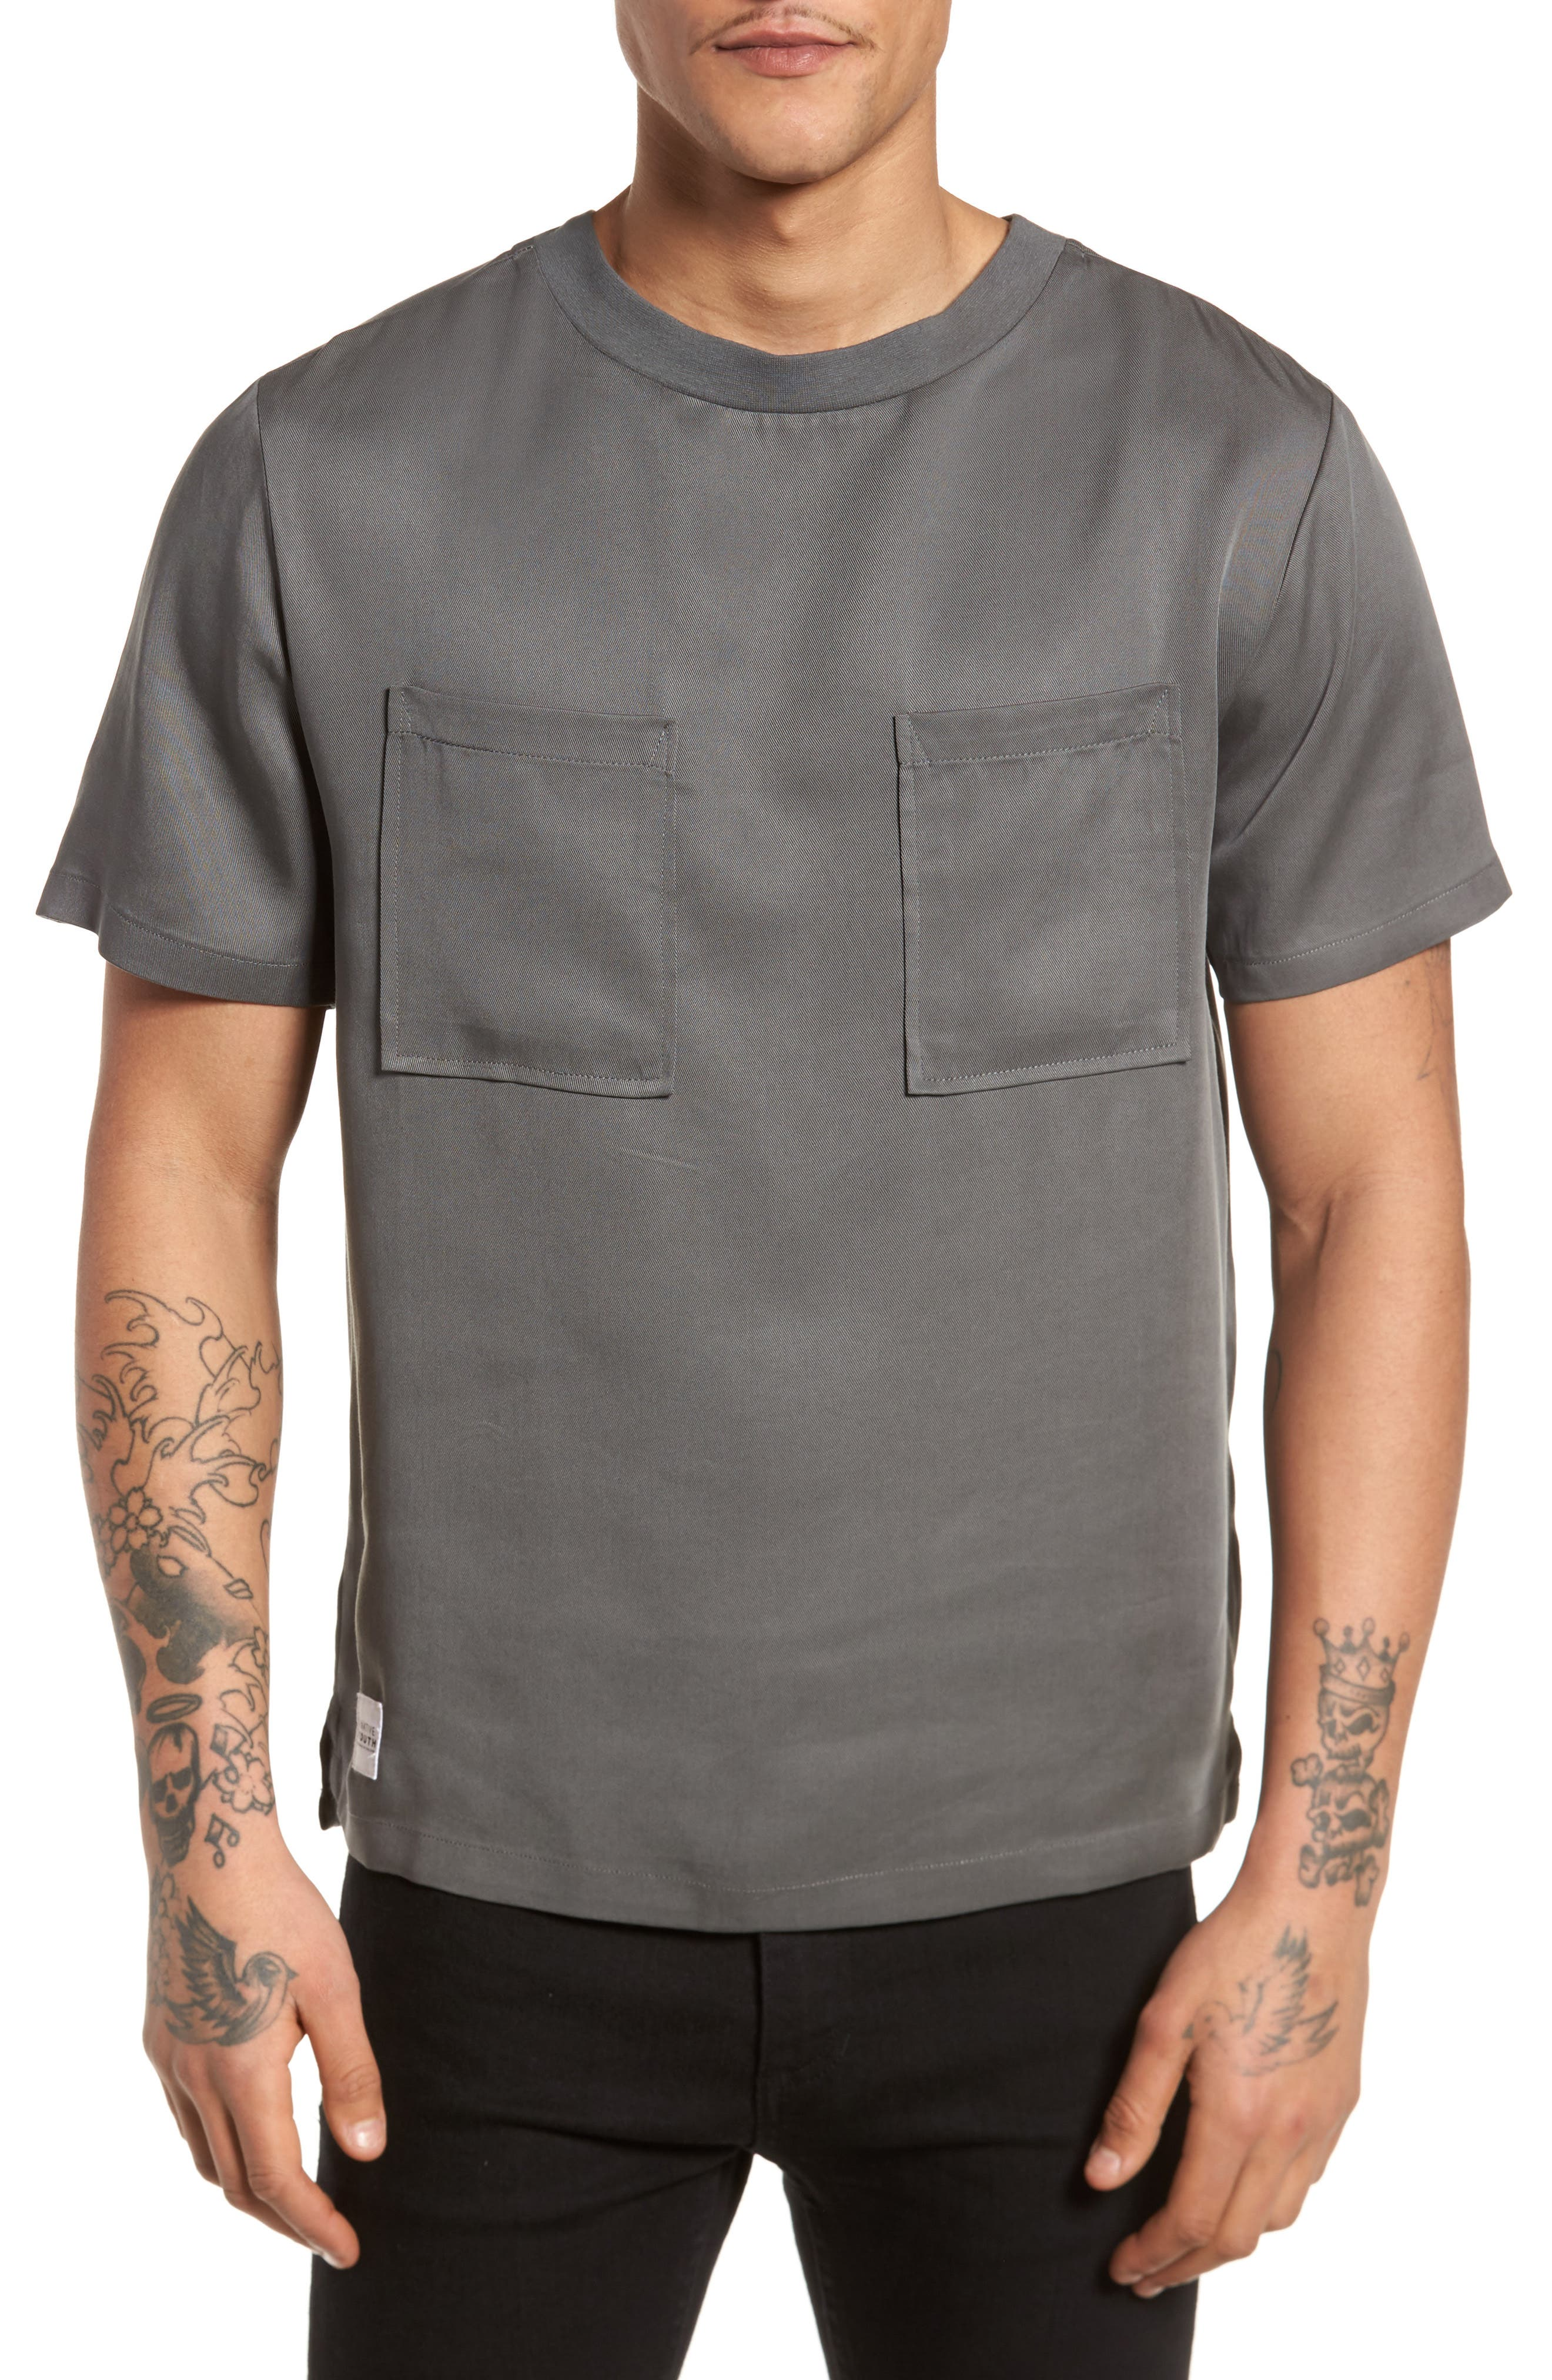 Denali Woven T-Shirt,                         Main,                         color, 020